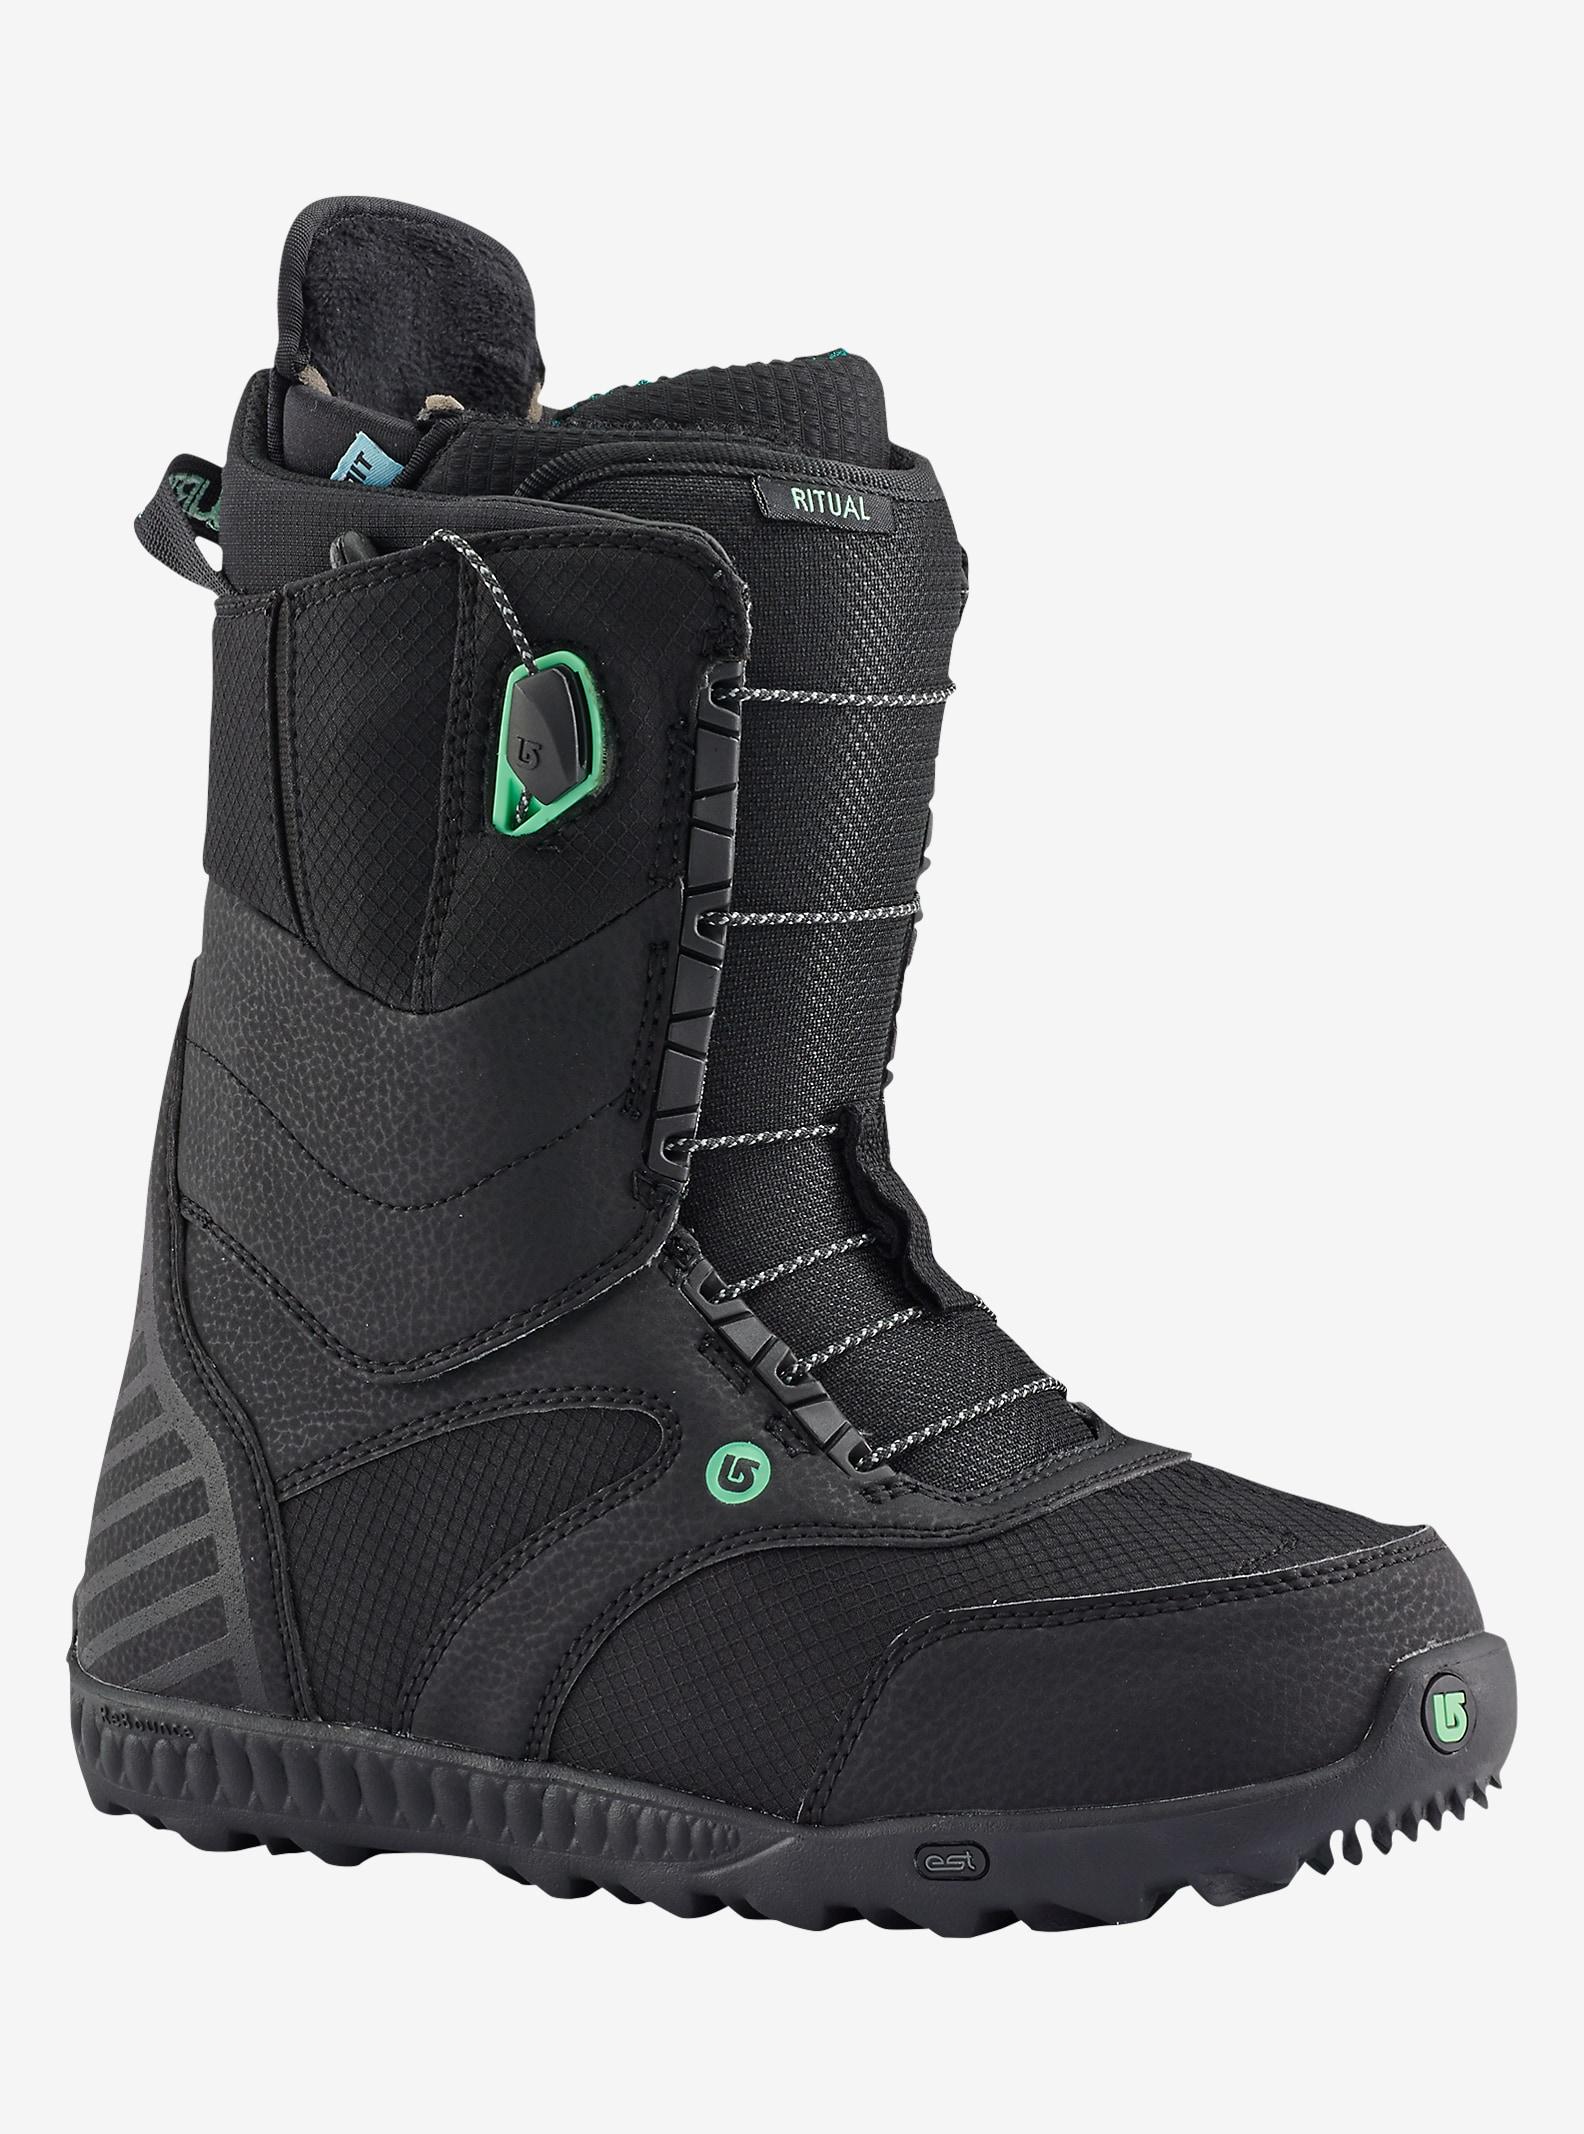 Burton Ritual Snowboard Boot shown in Black